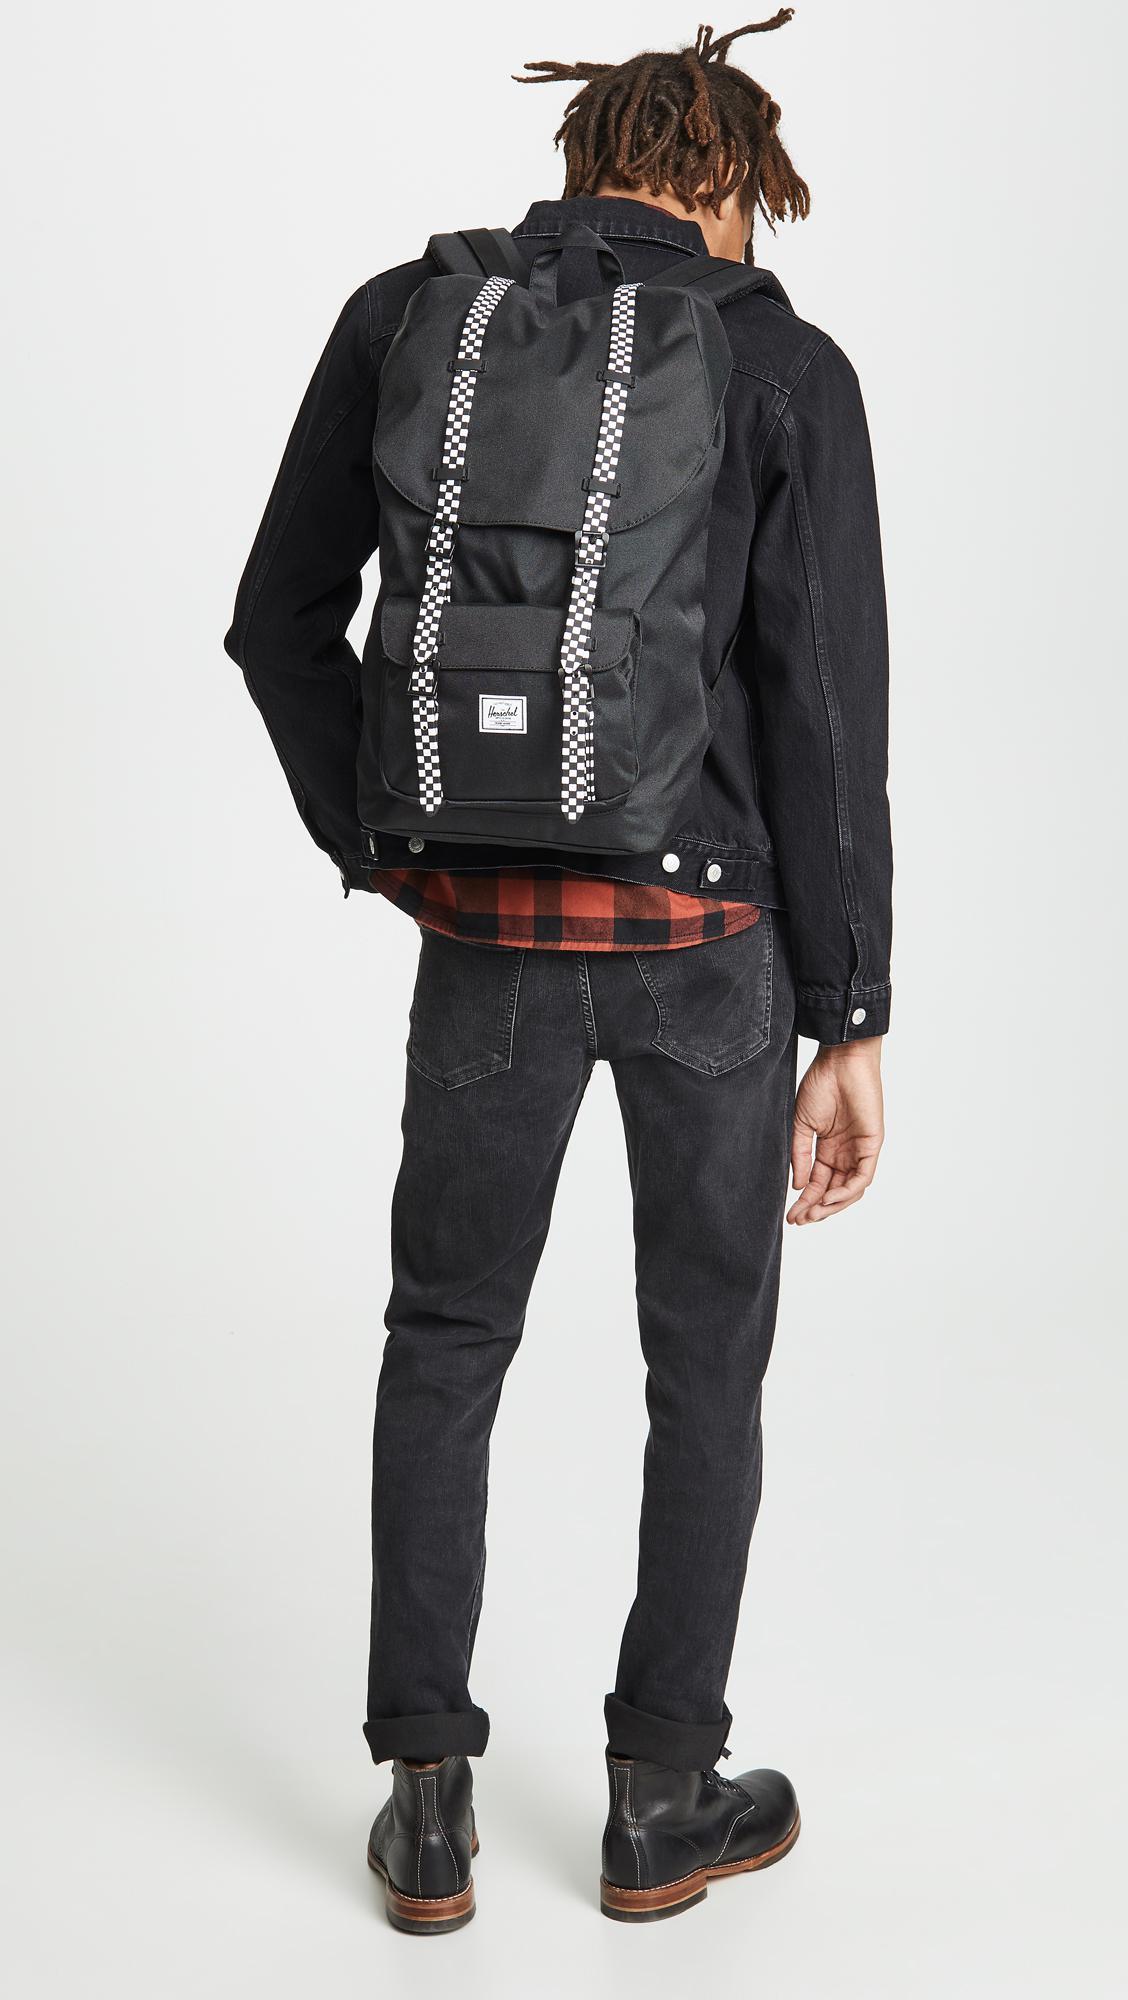 Herschel Supply Co. - Black Little America Backpack for Men - Lyst. View  fullscreen 667fa04547